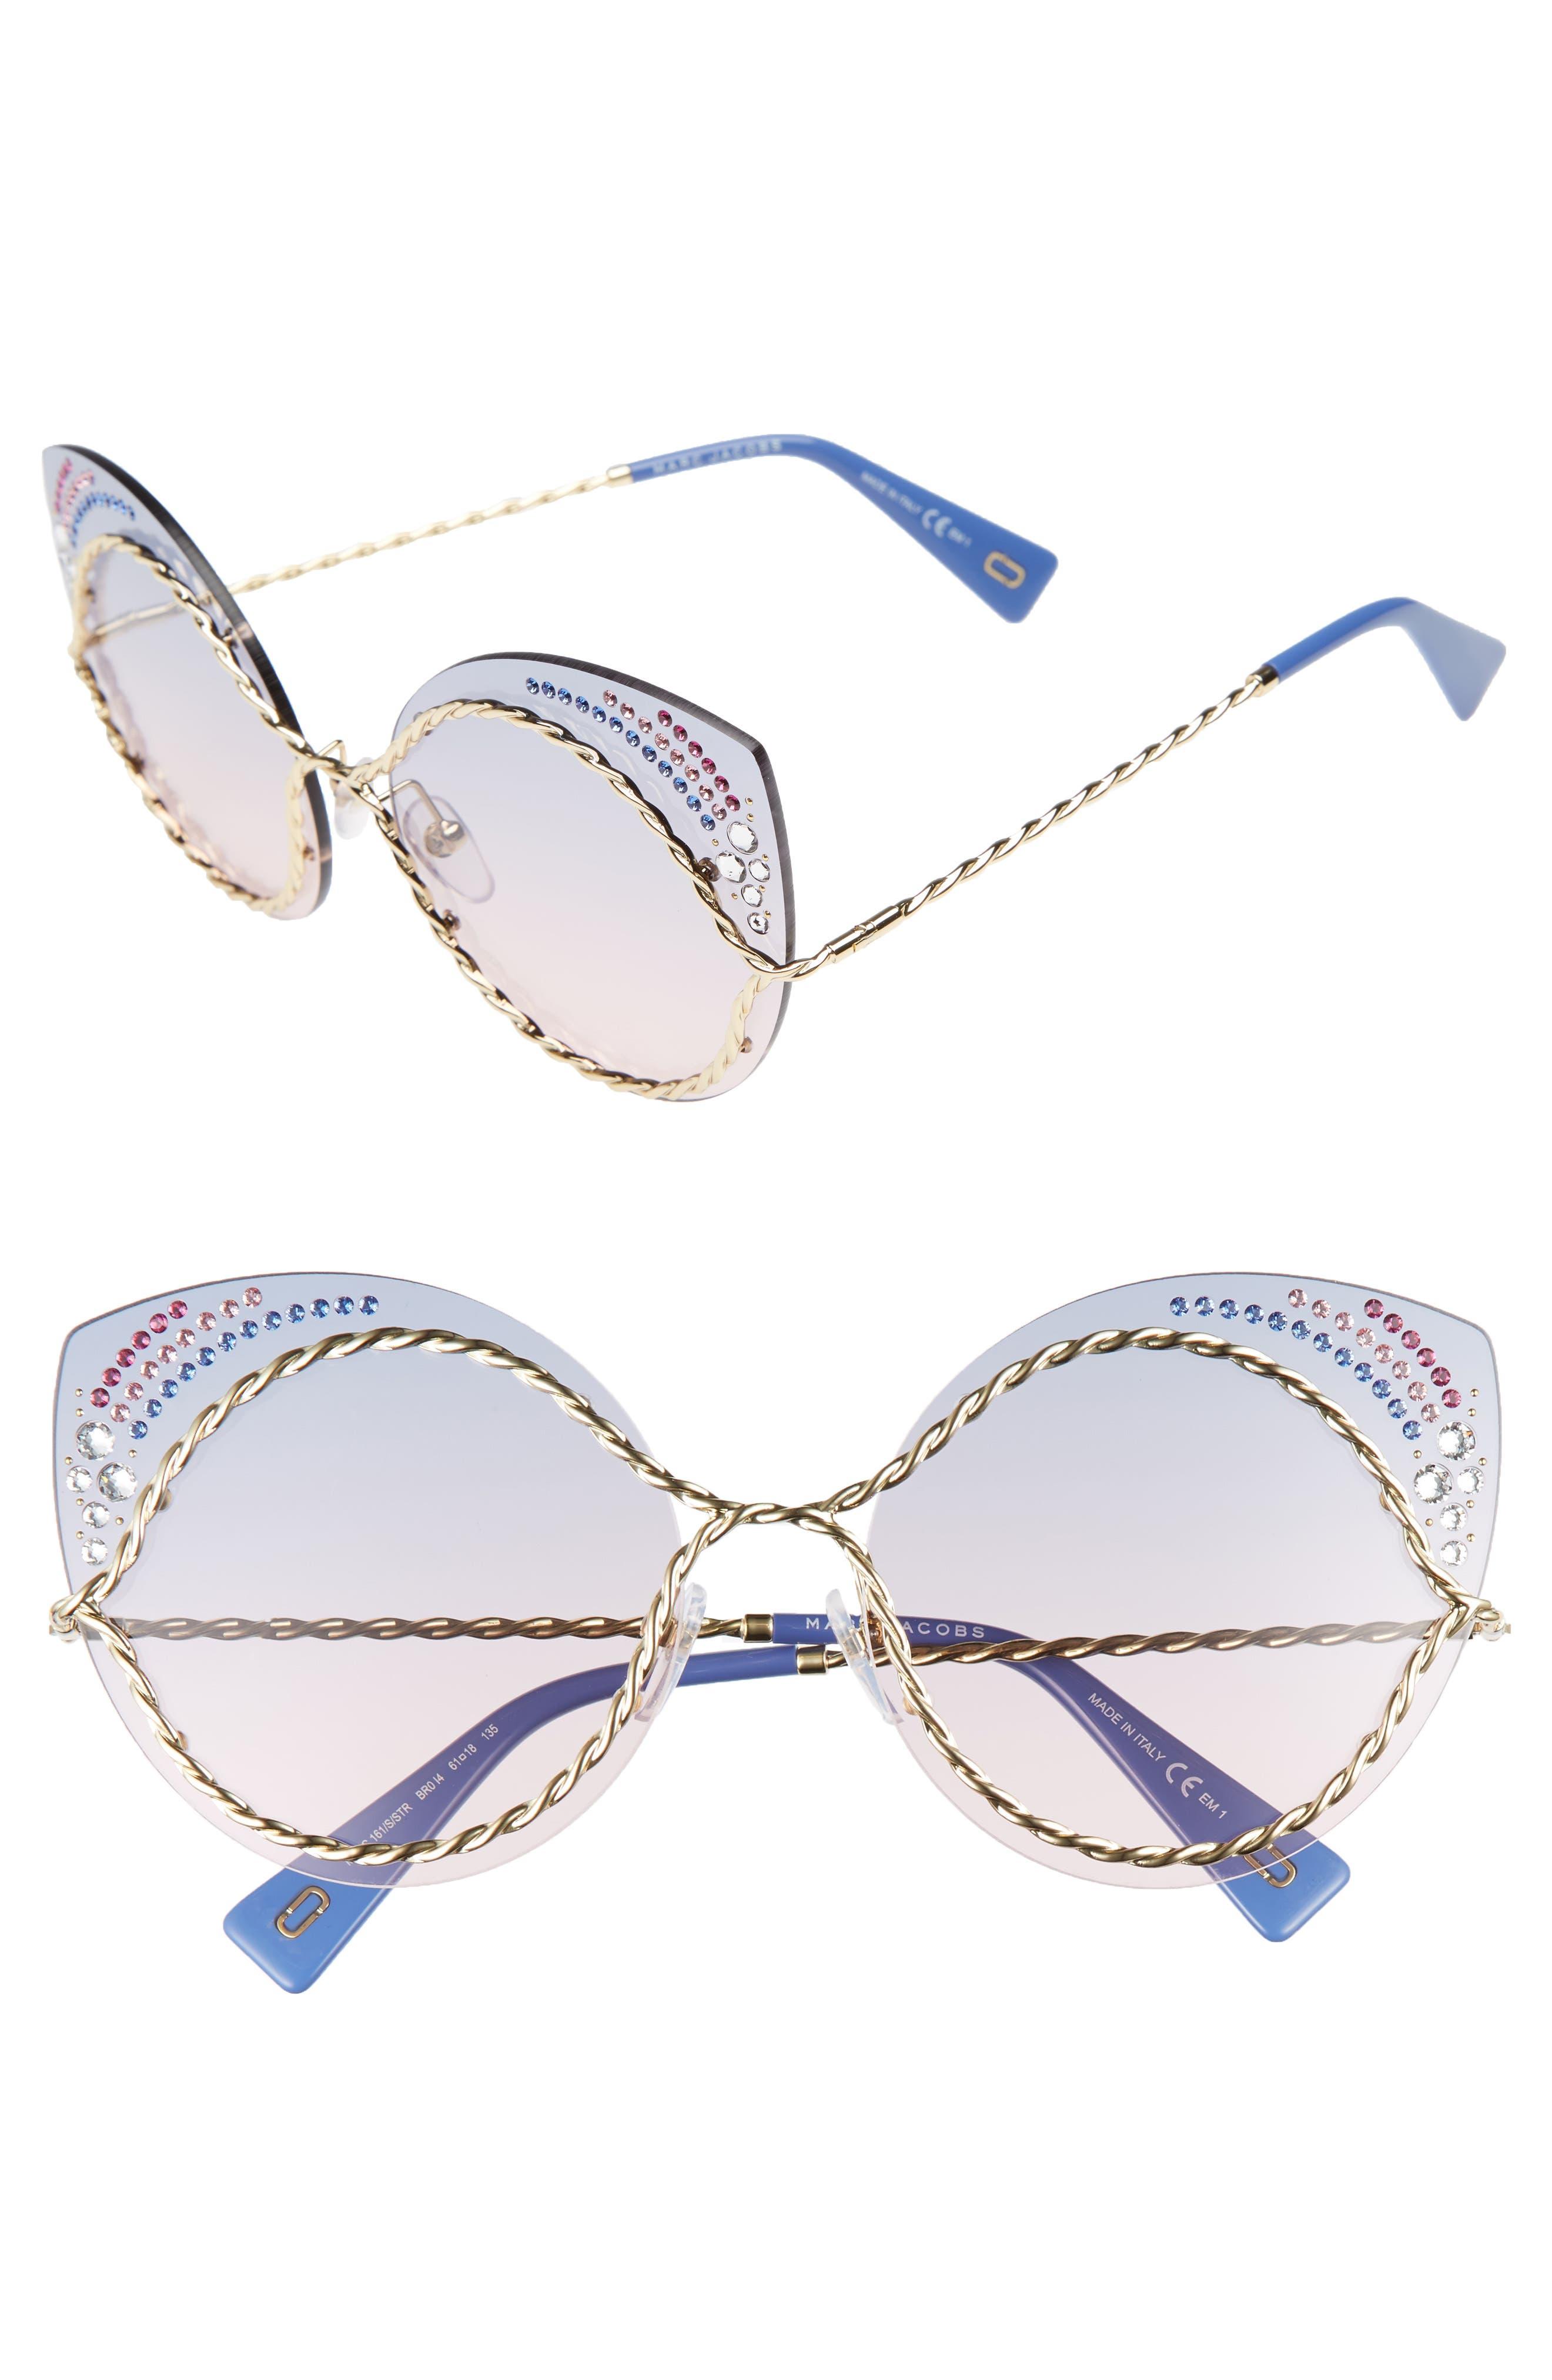 MARC JACOBS 61mm Rimless Gradient Cat Eye Sunglasses